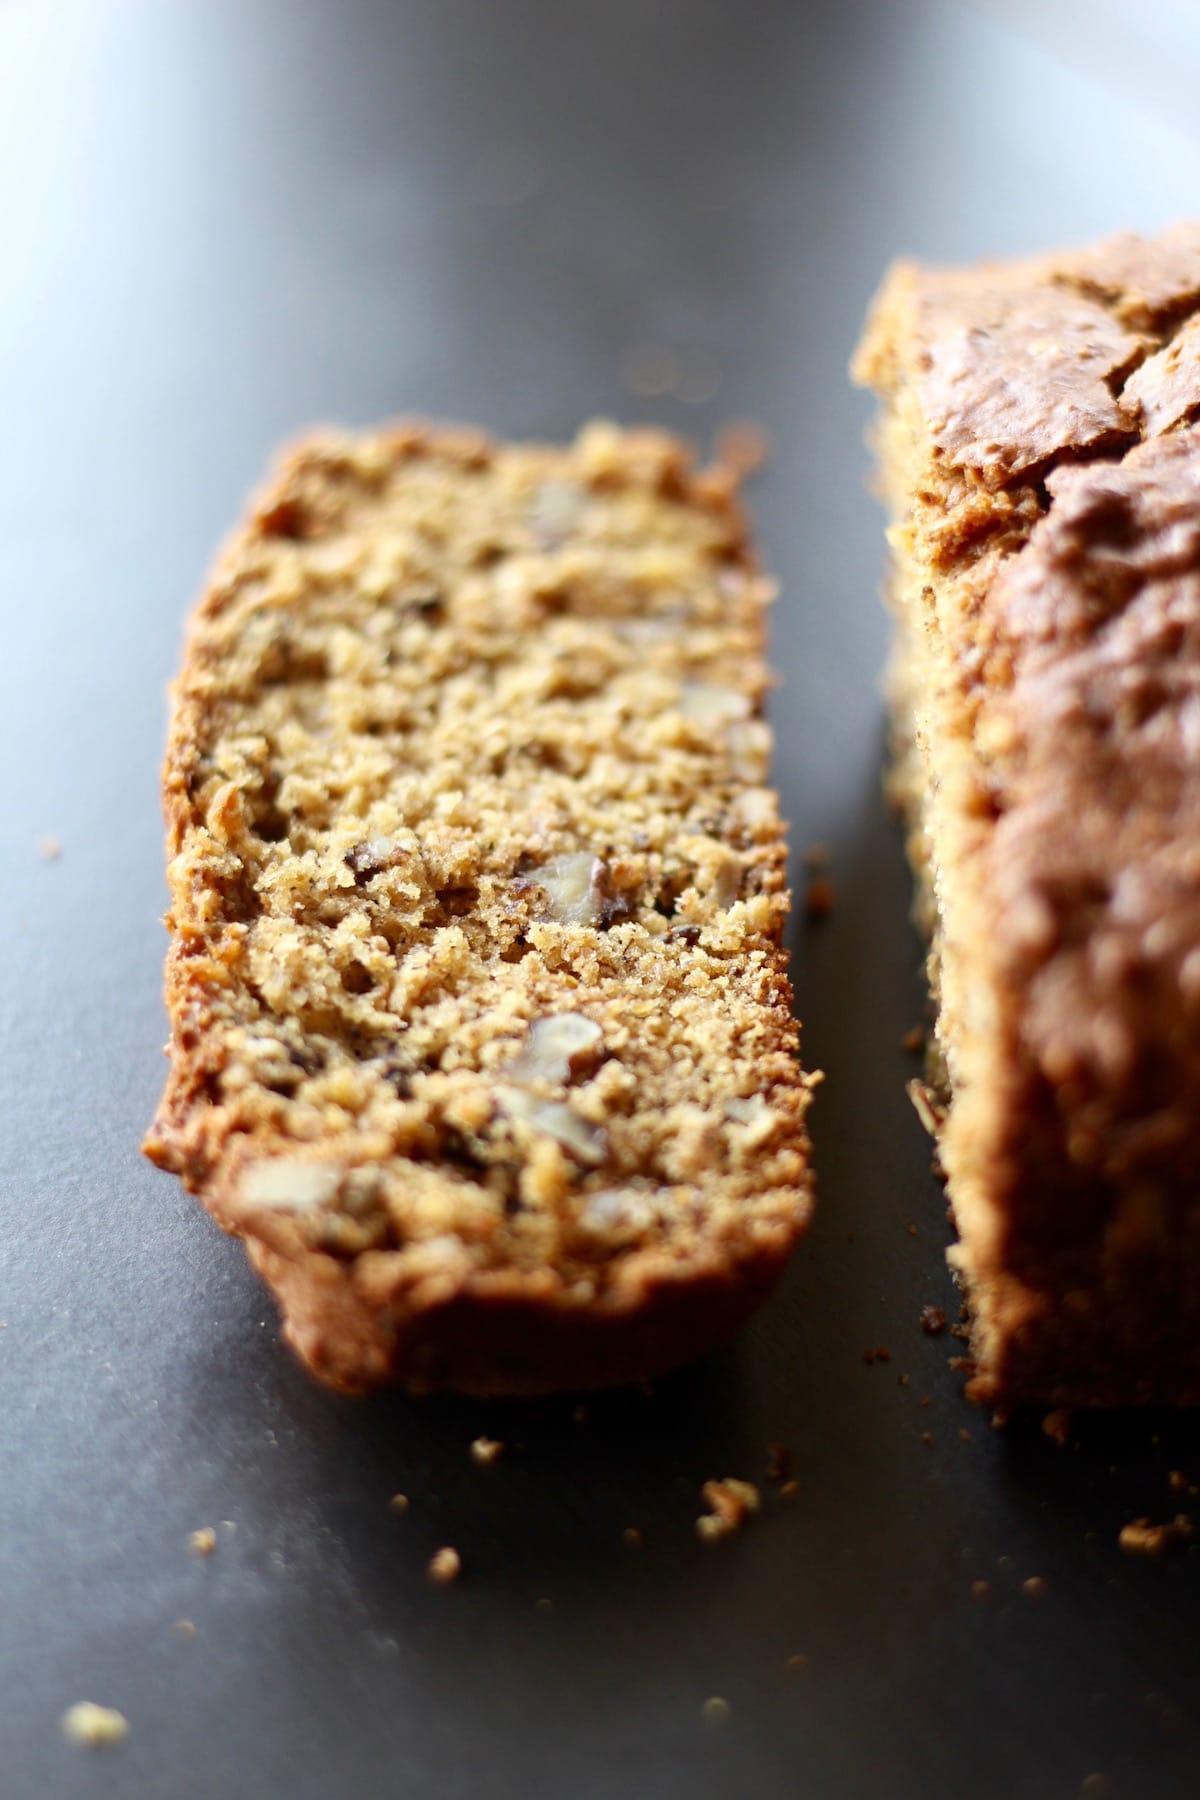 crispy walnuts in a loaf of bread